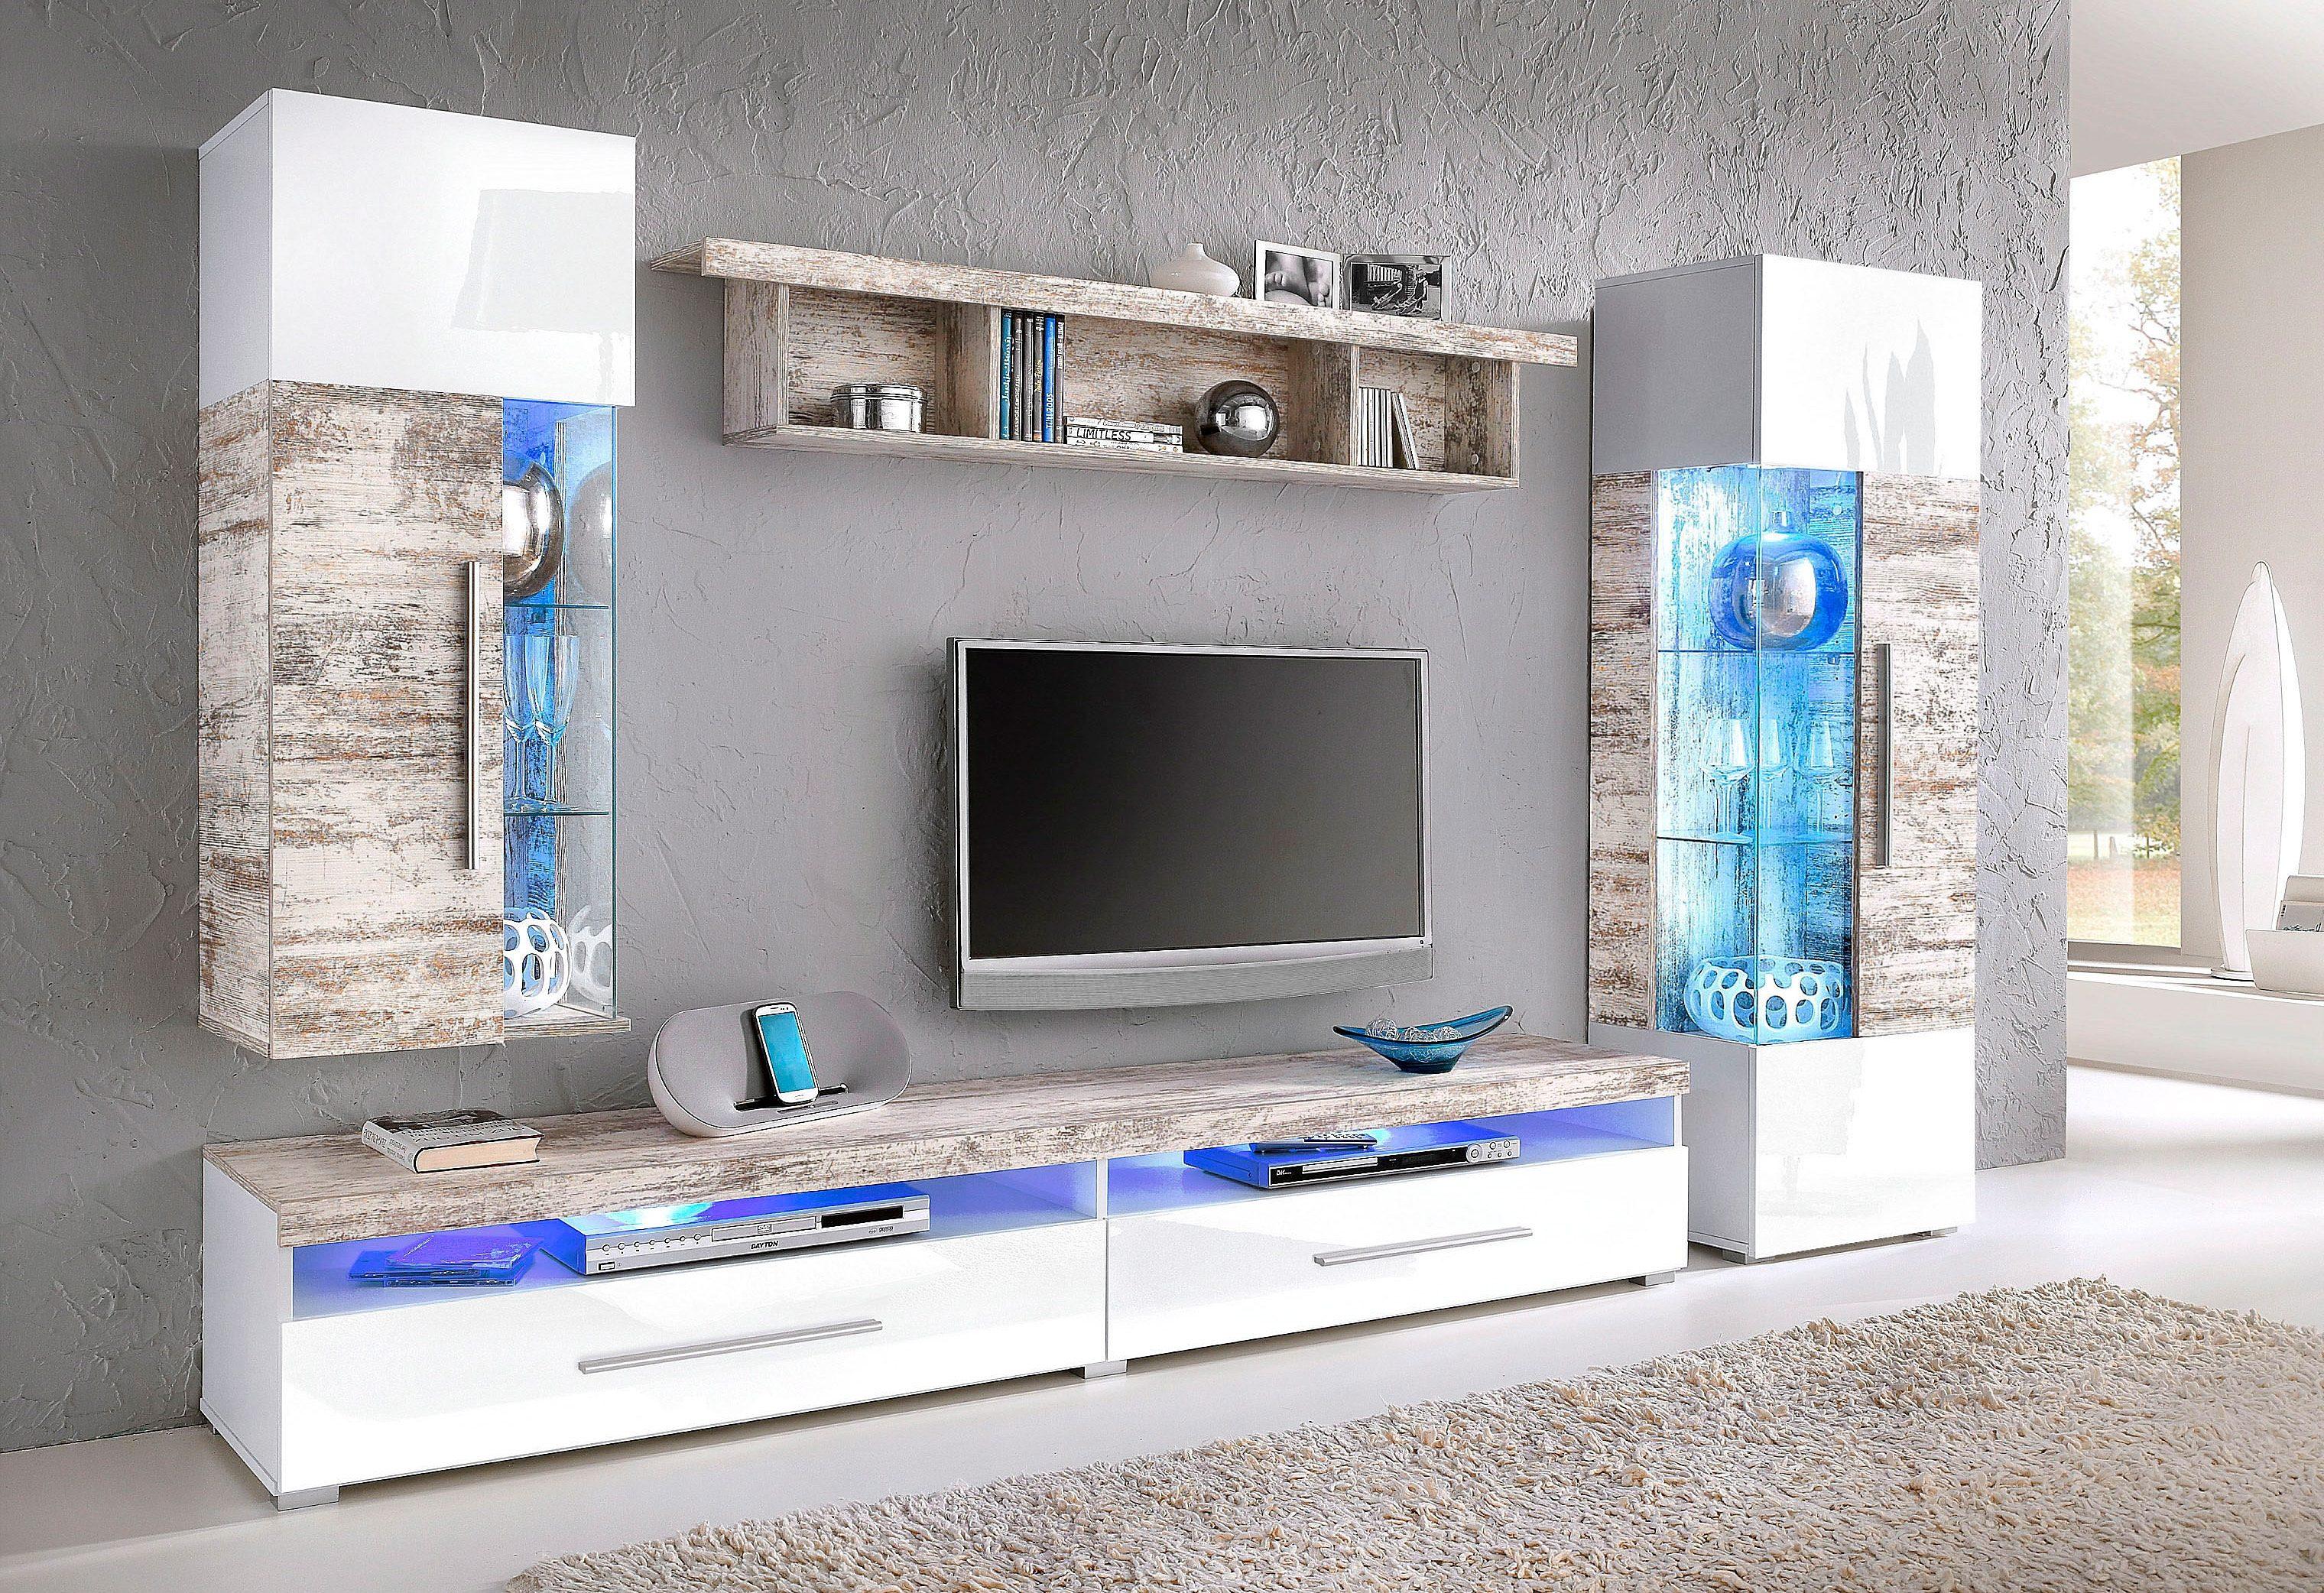 Schrankwand Weiss Fotos : Wohnwand kaufen schrankwand anbauwand otto